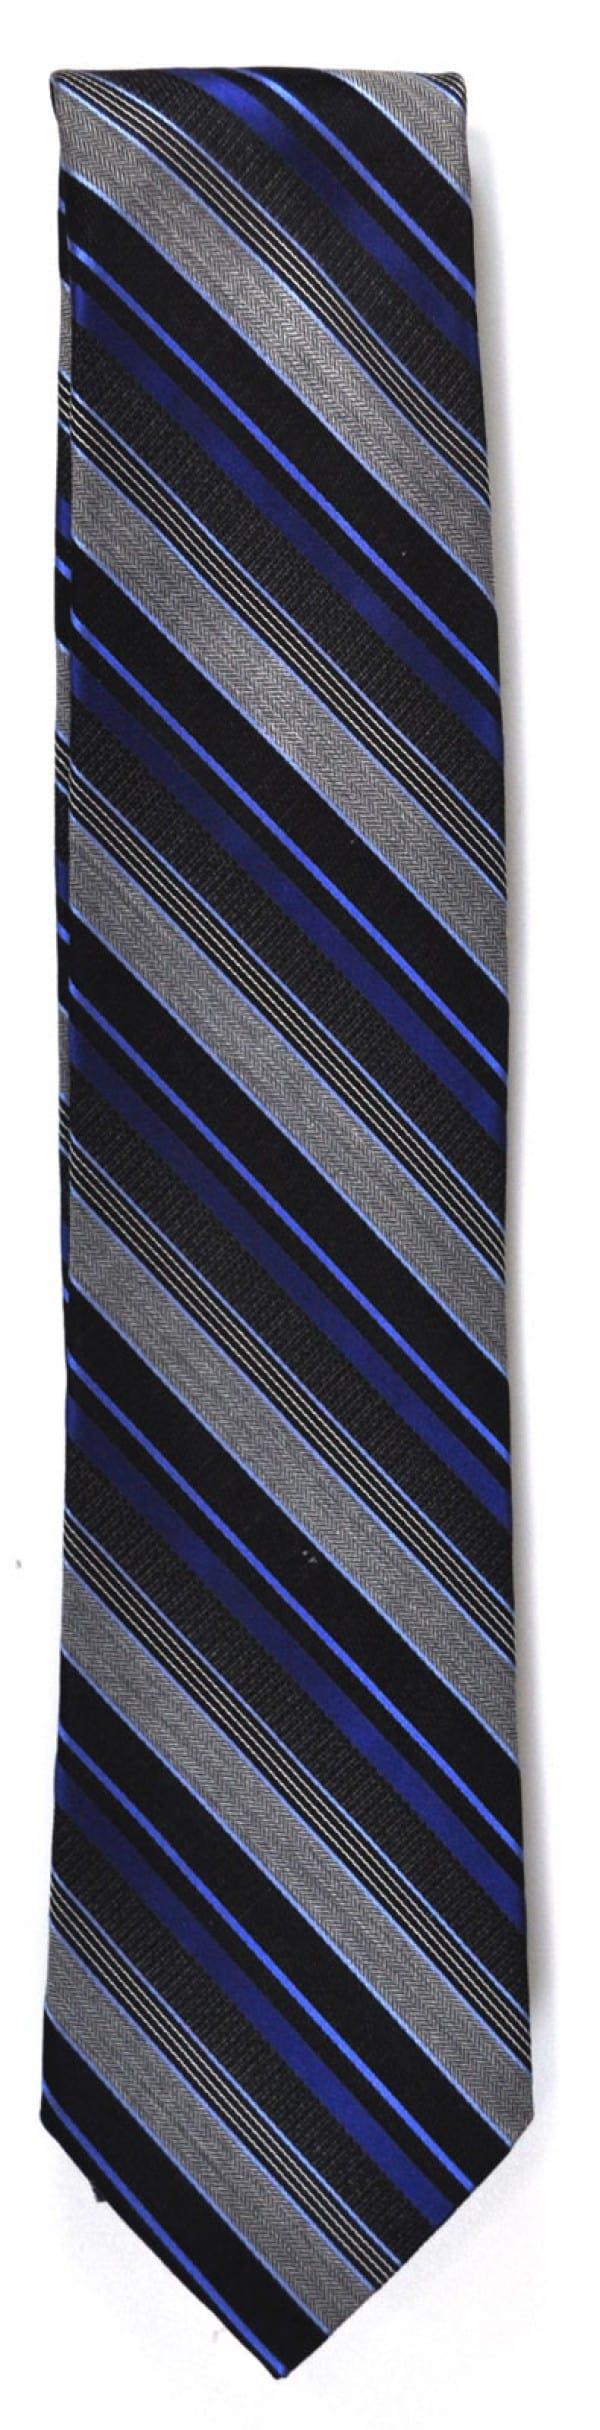 Pure silk blue stripe tie